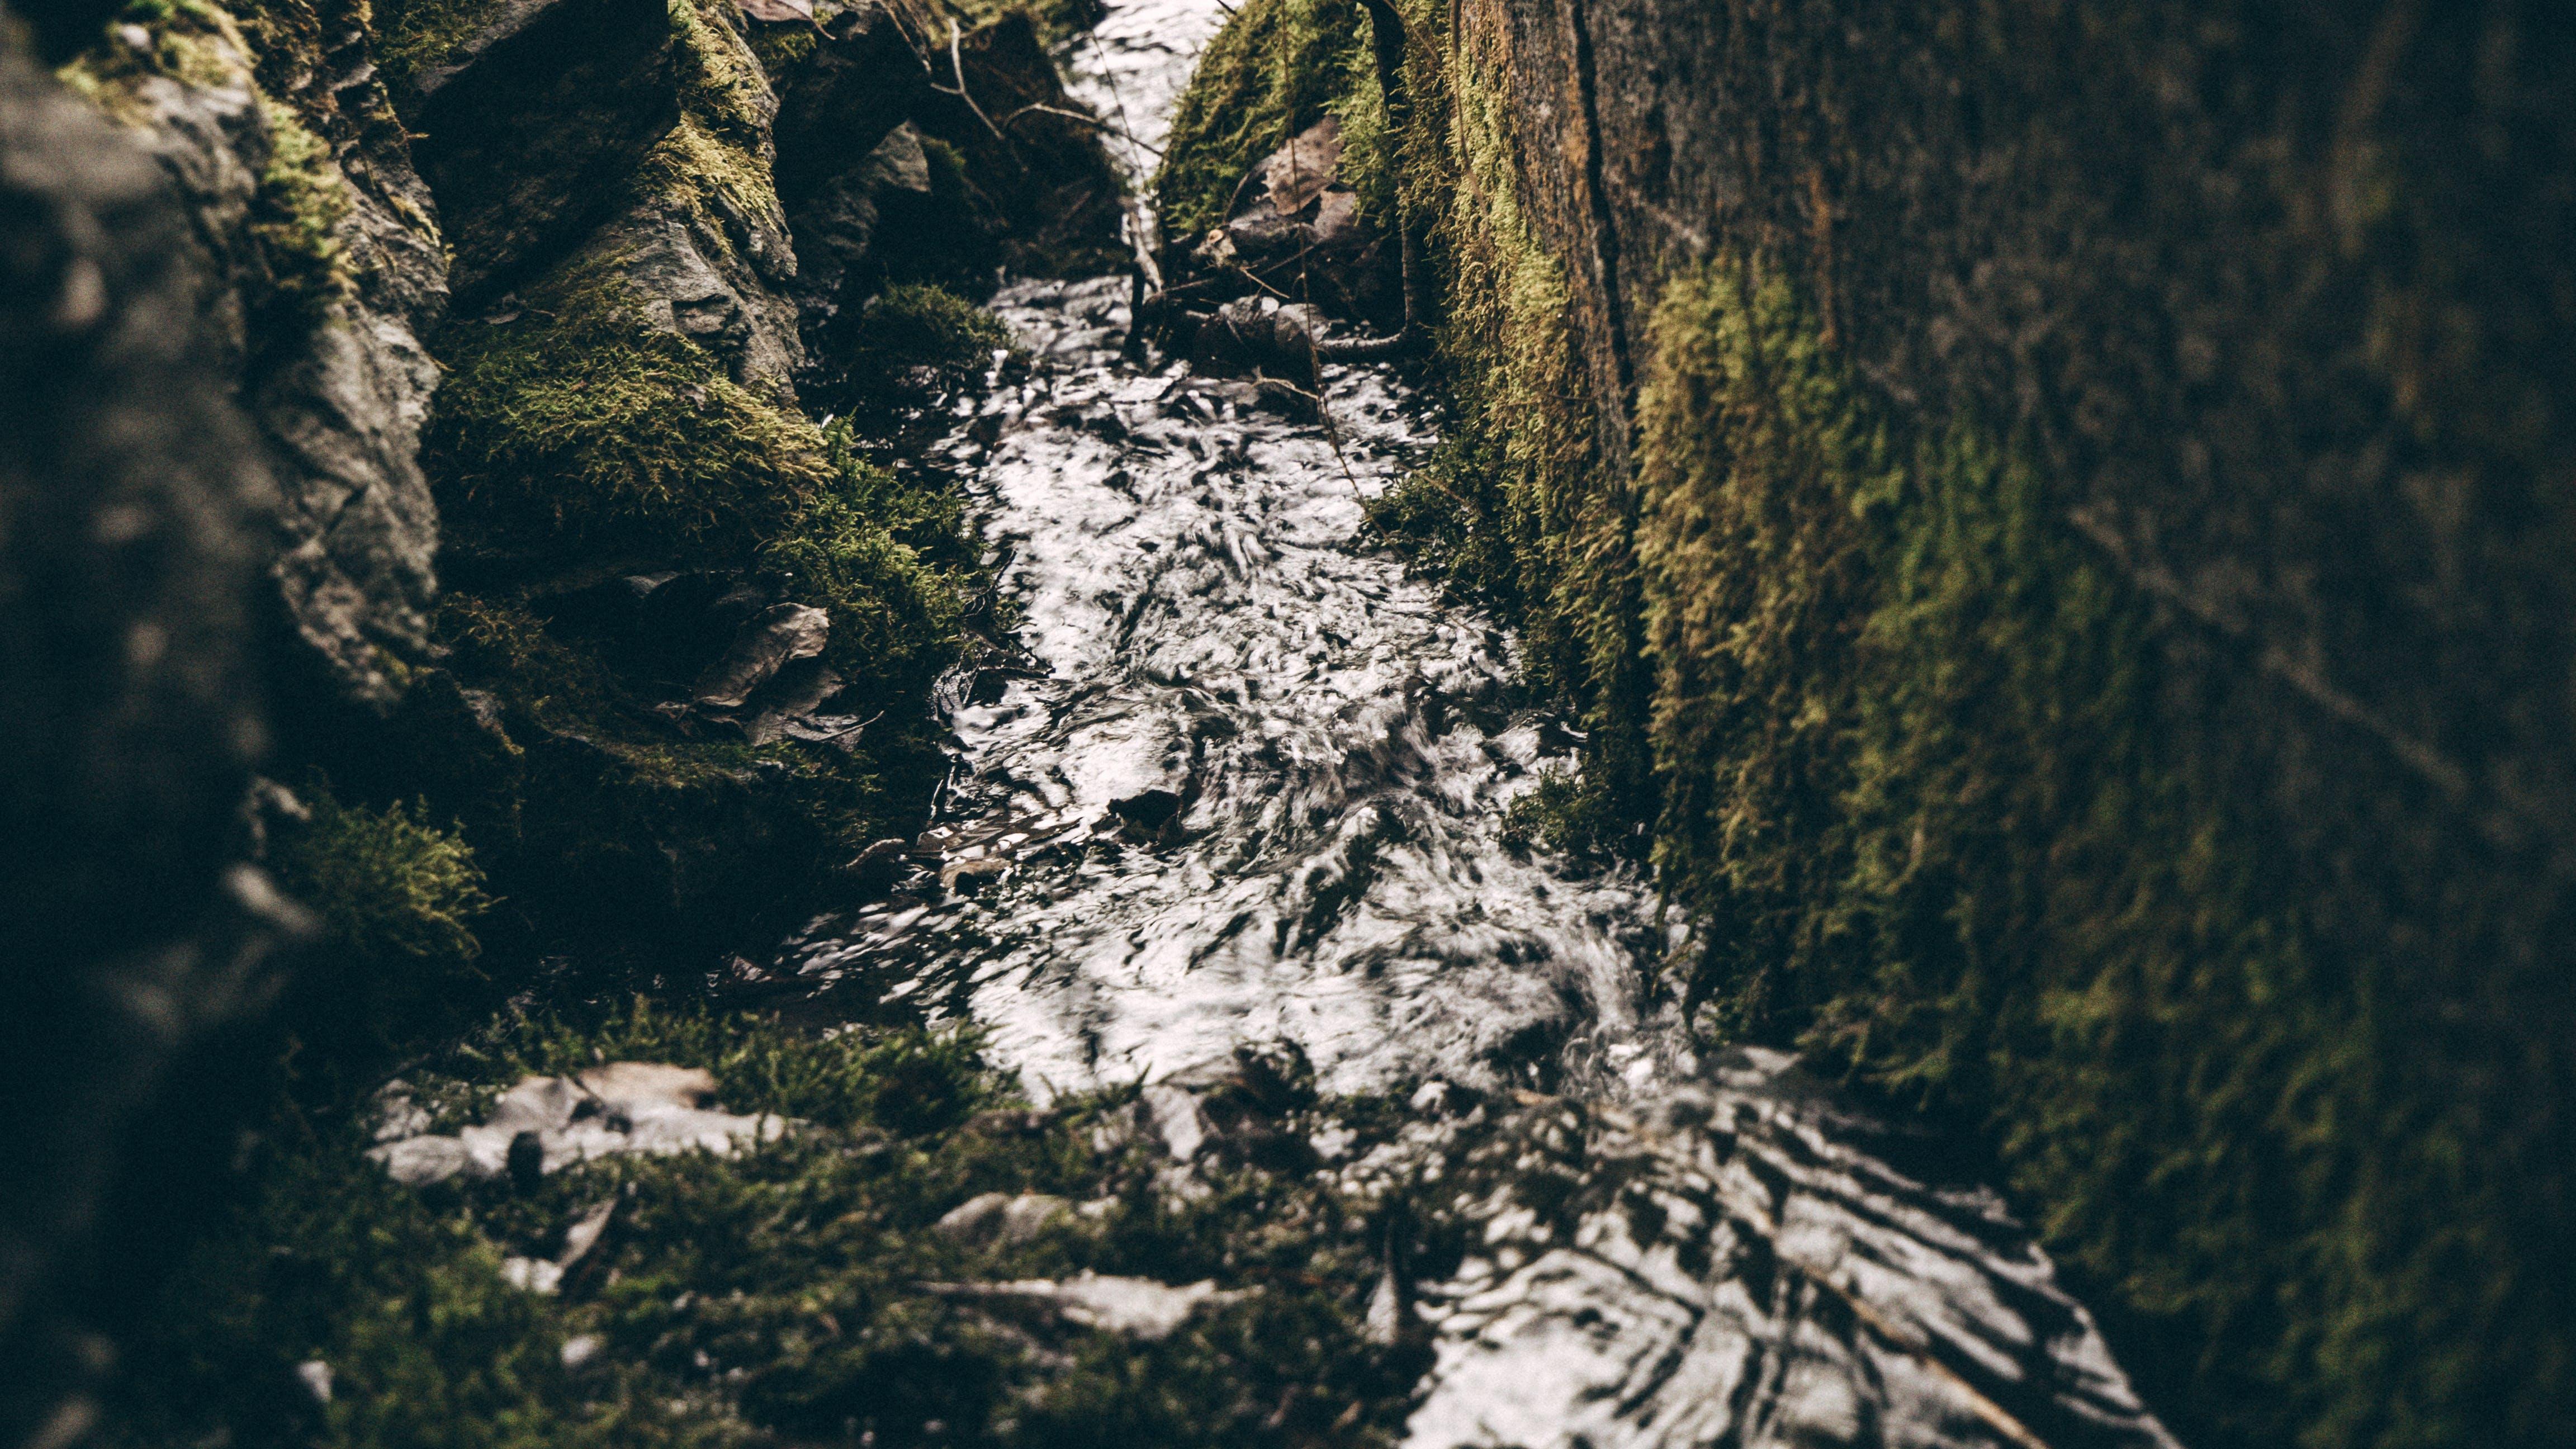 Gratis lagerfoto af å, sten, vand